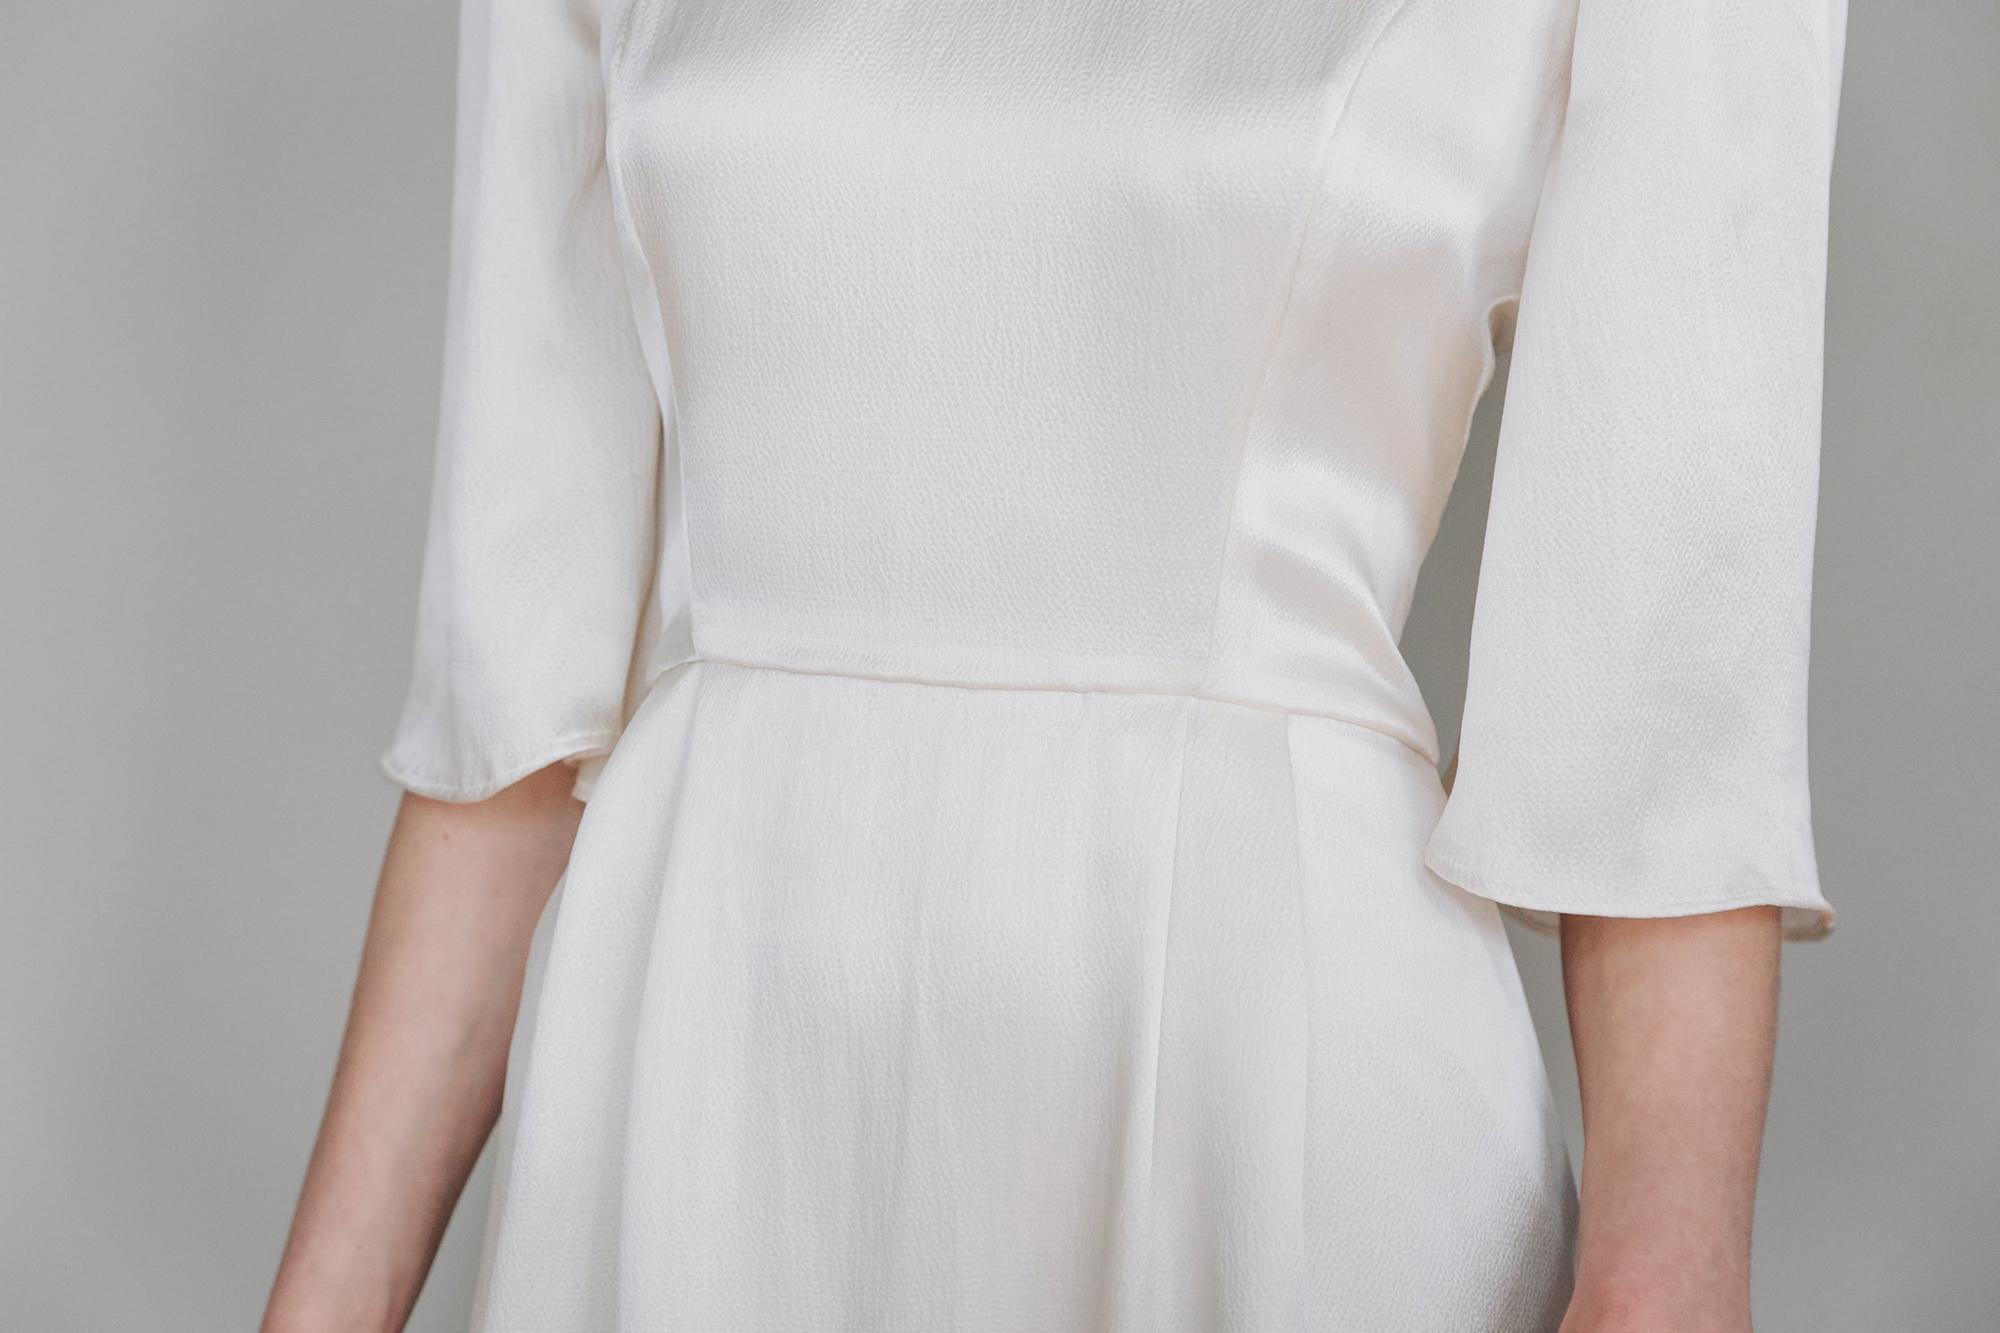 Kate-Beaumont-Lunaria-Bohemian-Hammered-Silk-Wedding-Dress-Sleeves-5.jpg